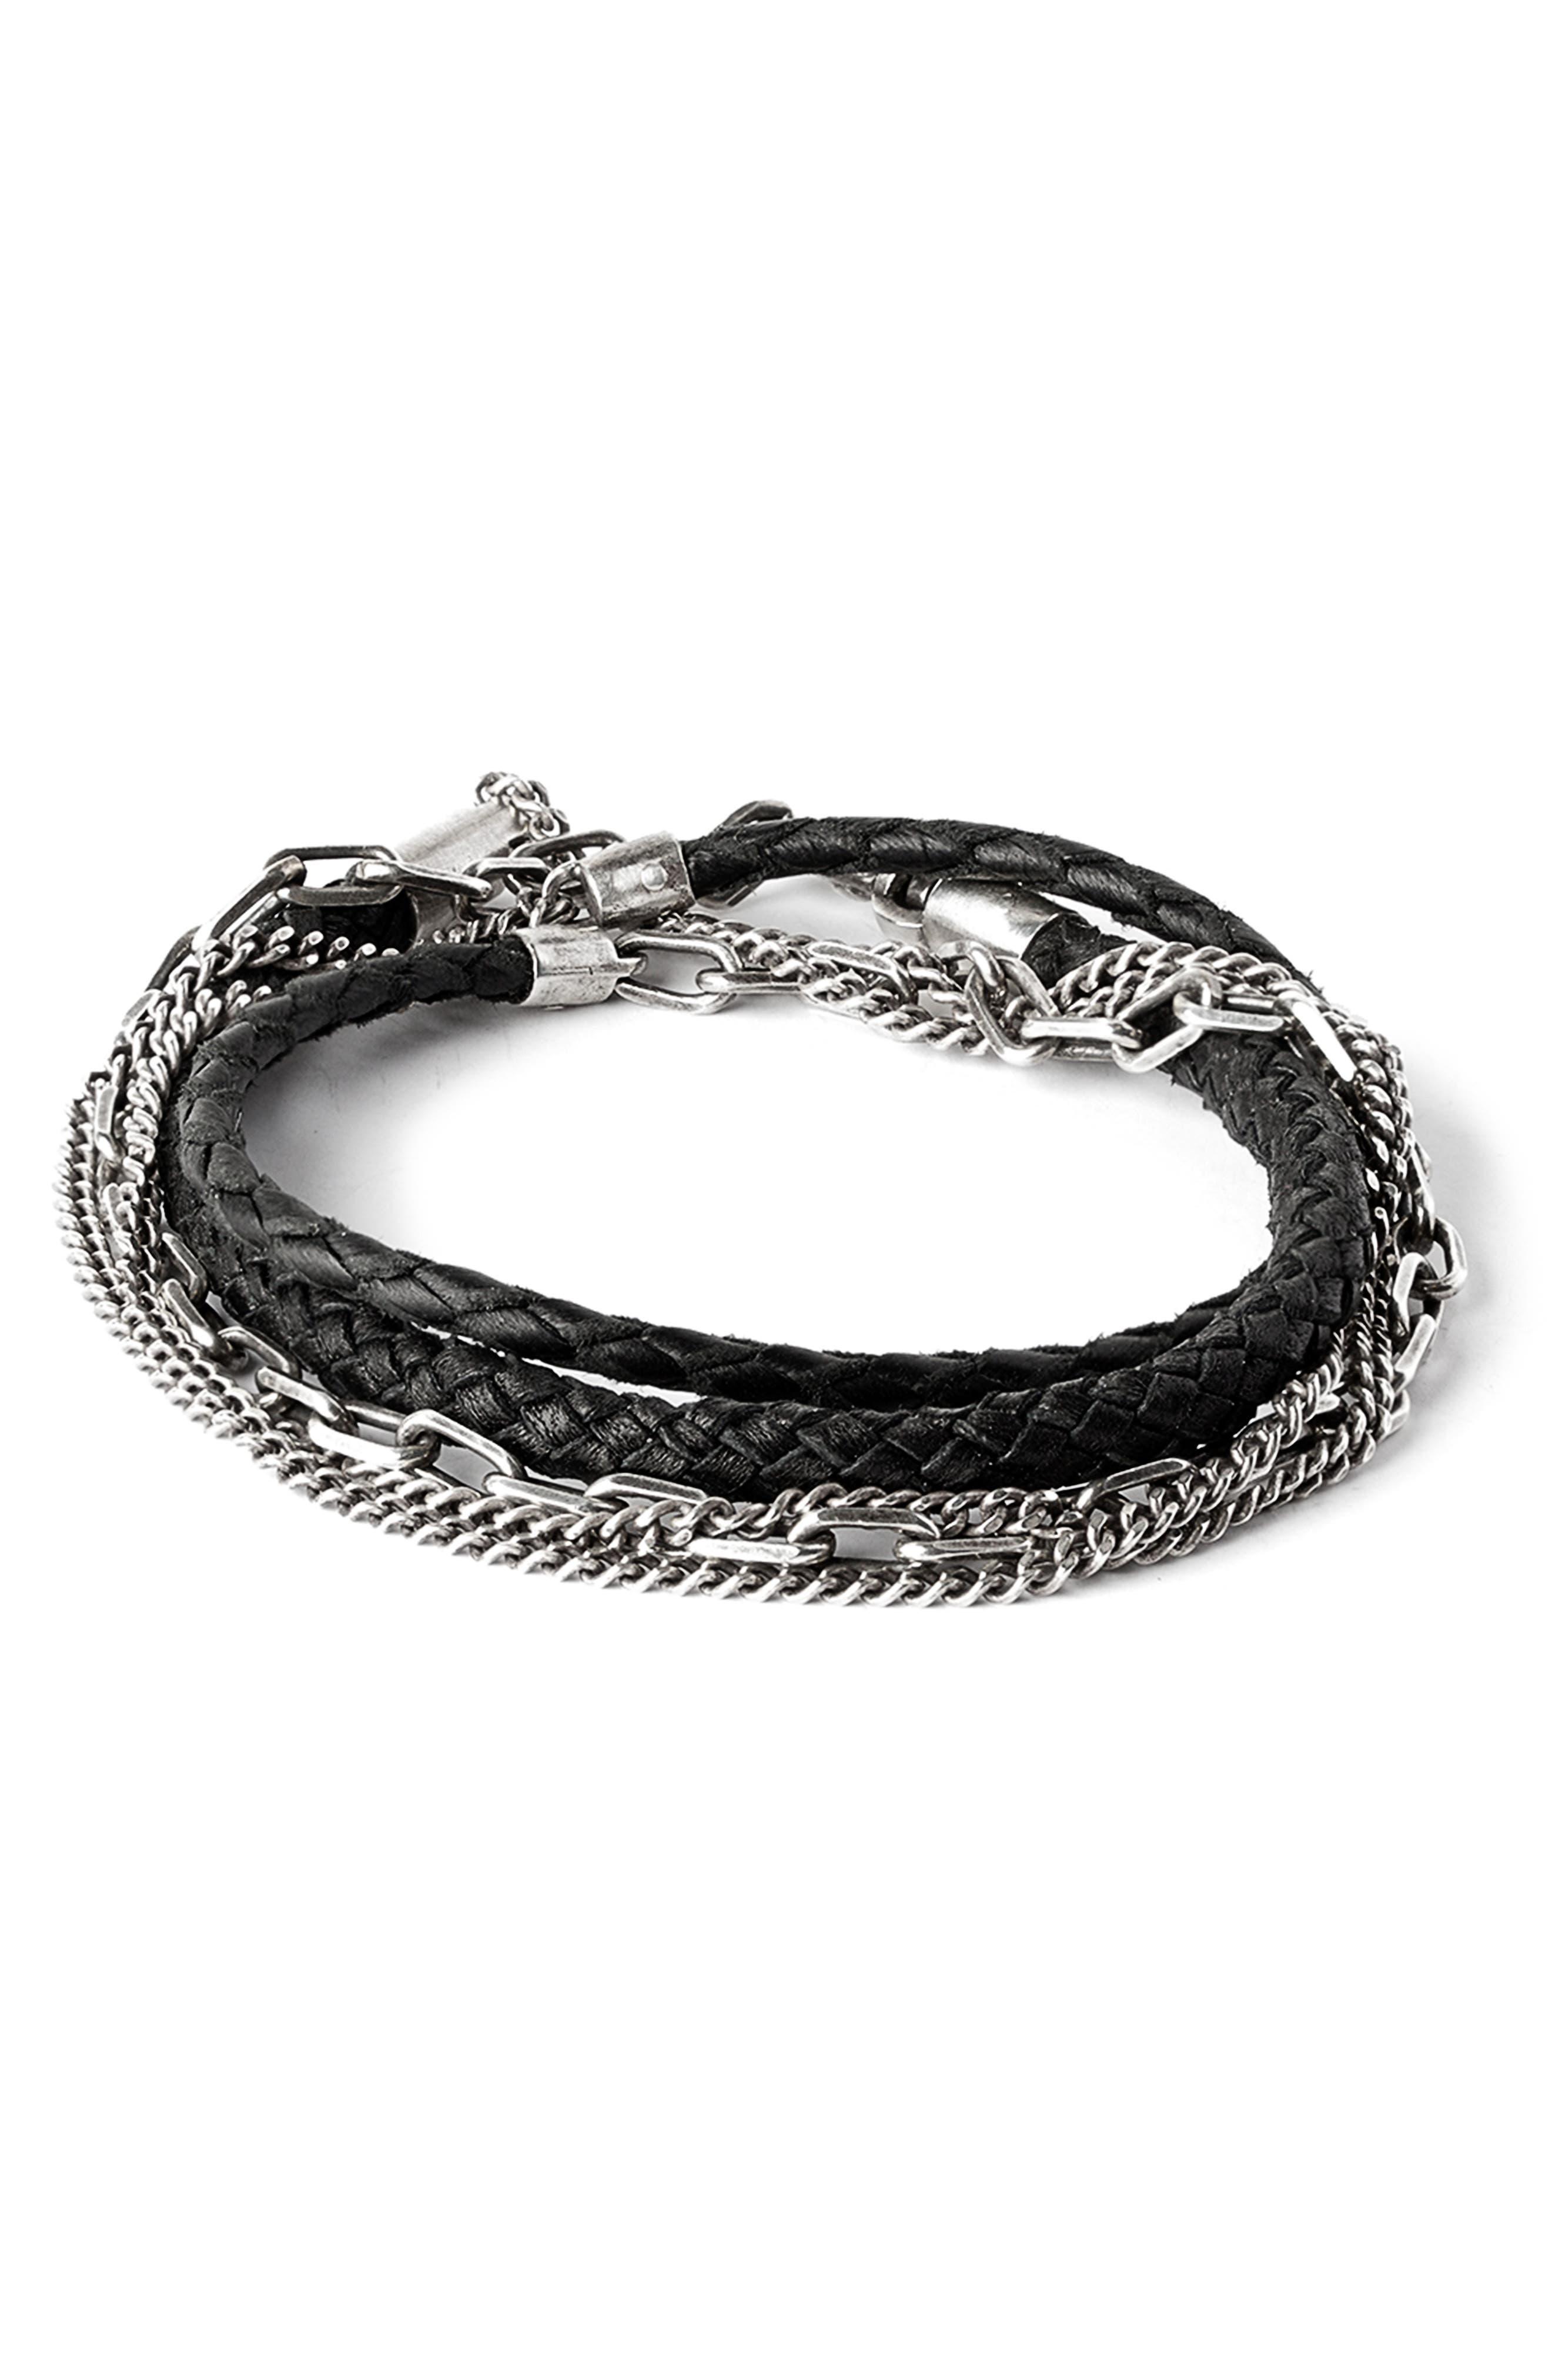 Braided Leather & Chain Multi Wrap Bracelet,                             Main thumbnail 1, color,                             001